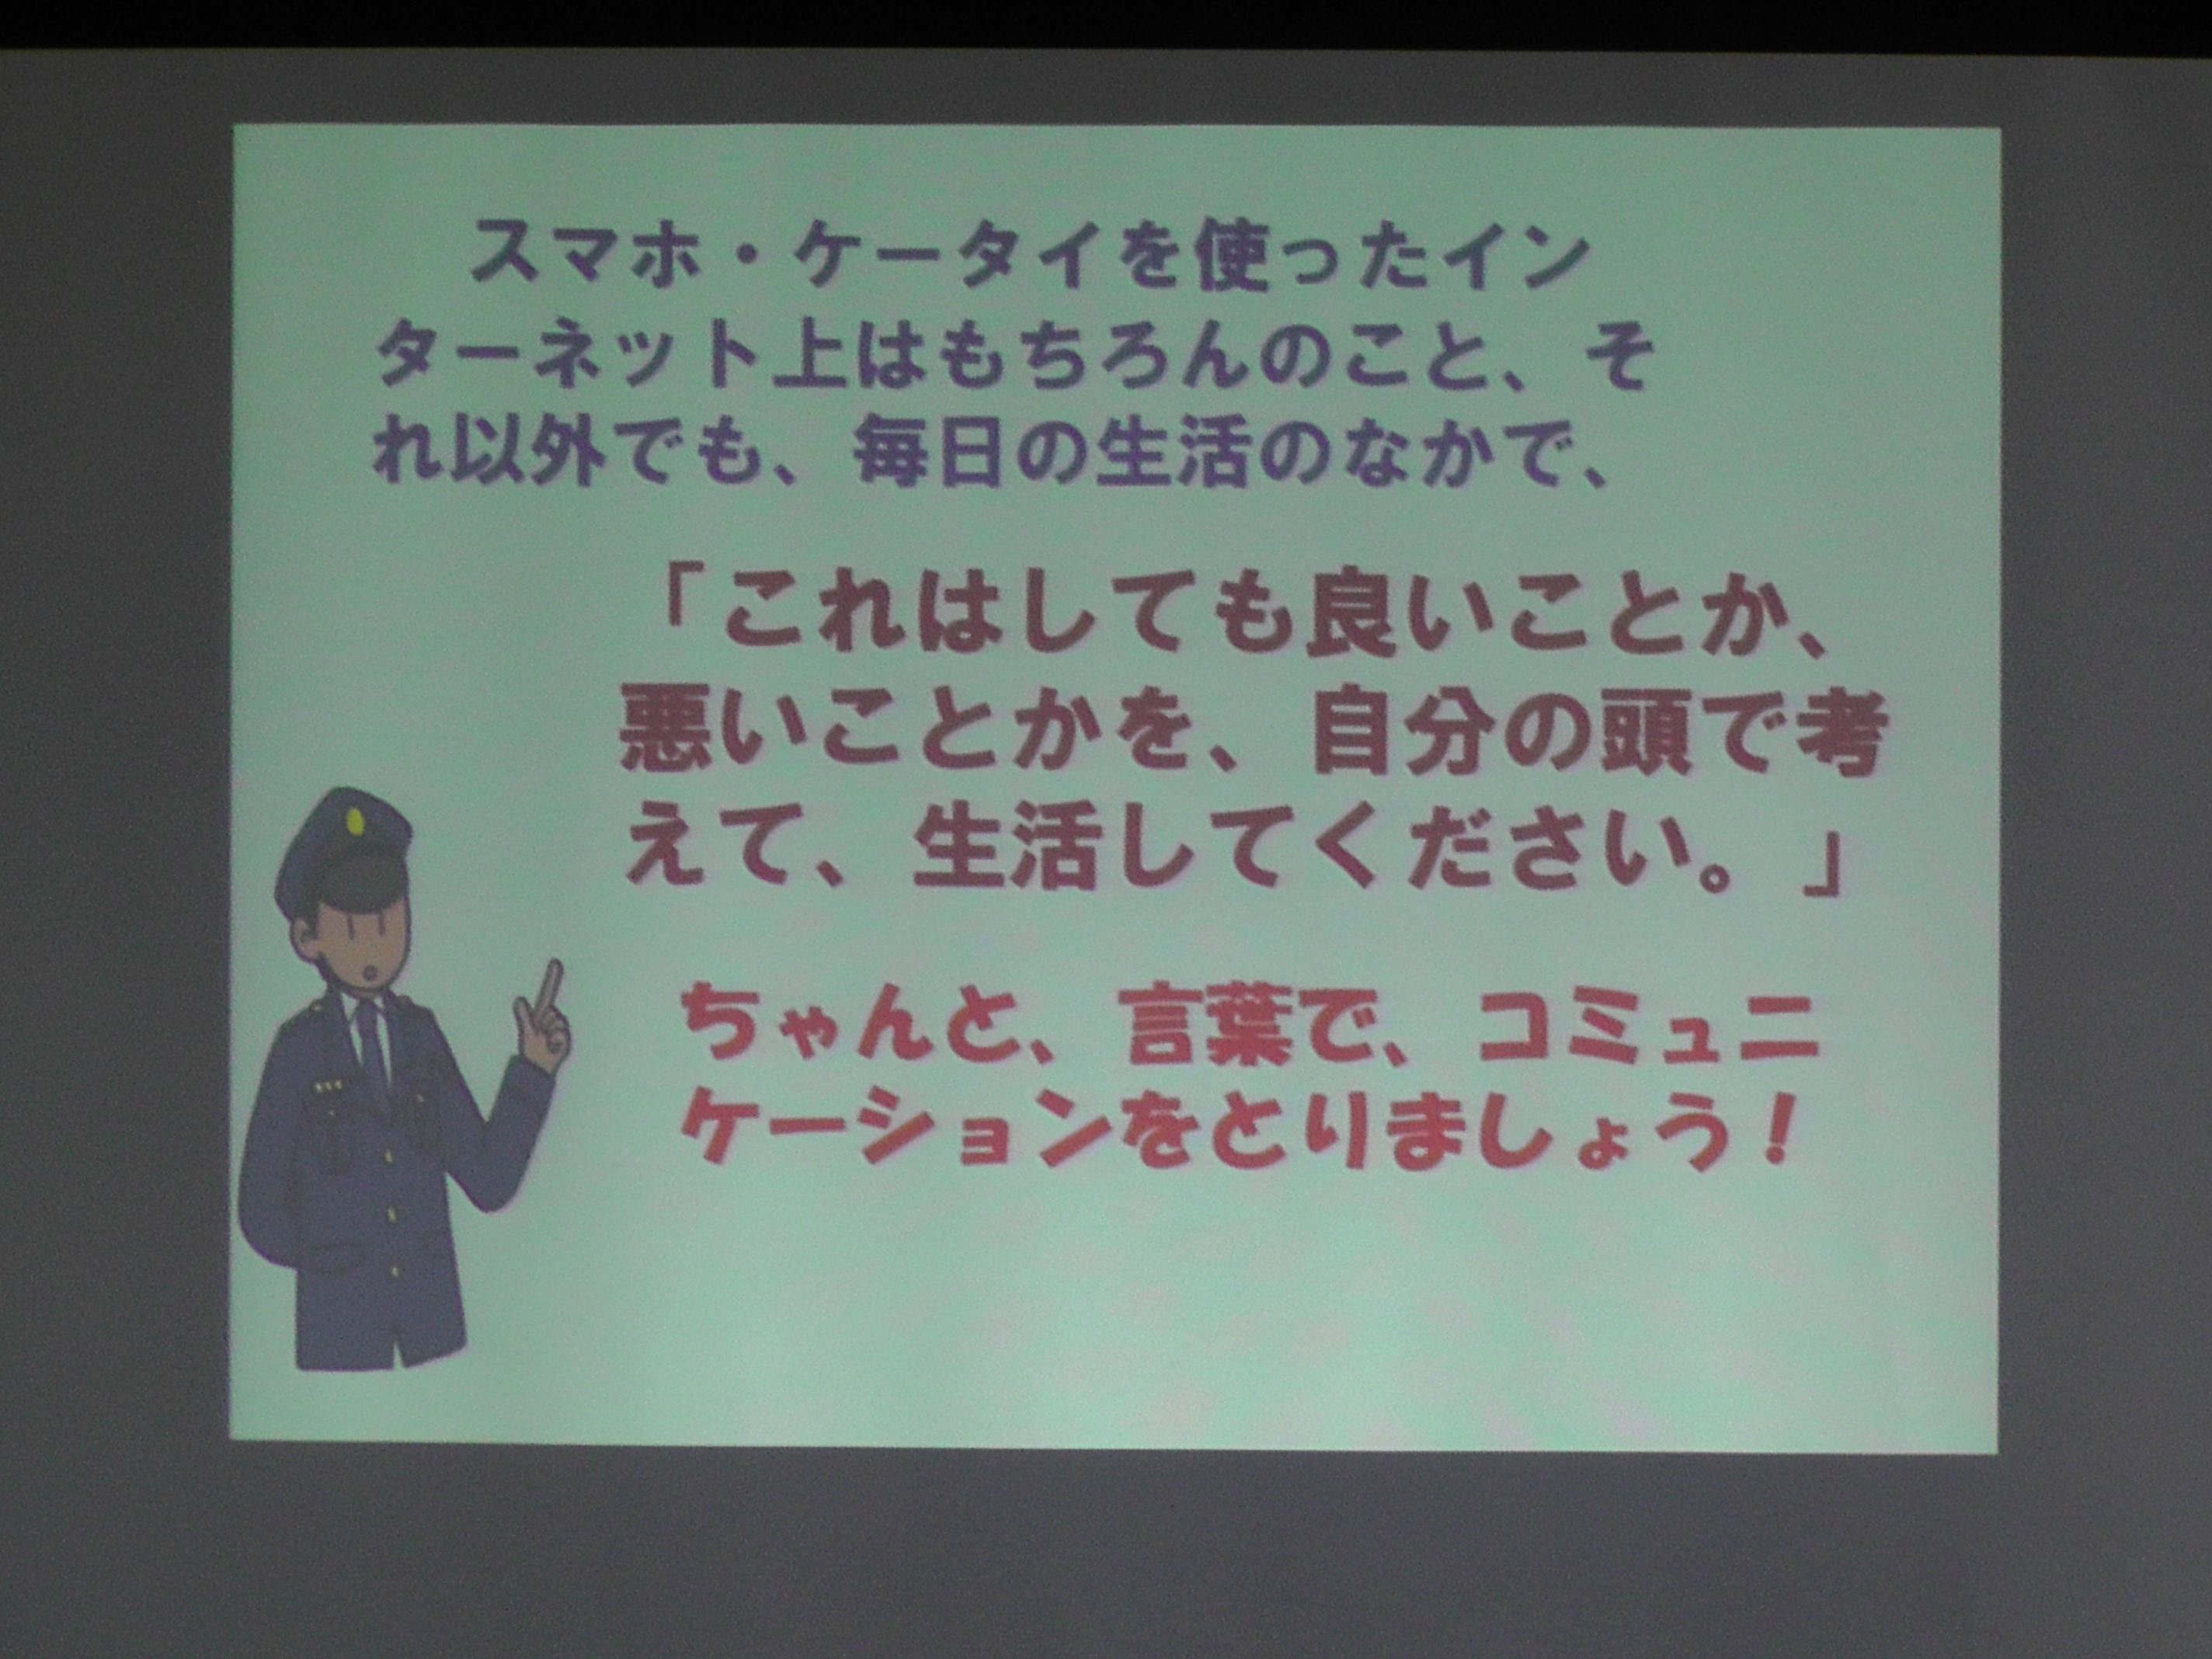 http://www.fuzoku.edu.mie-u.ac.jp/chu/yyfc.JPG